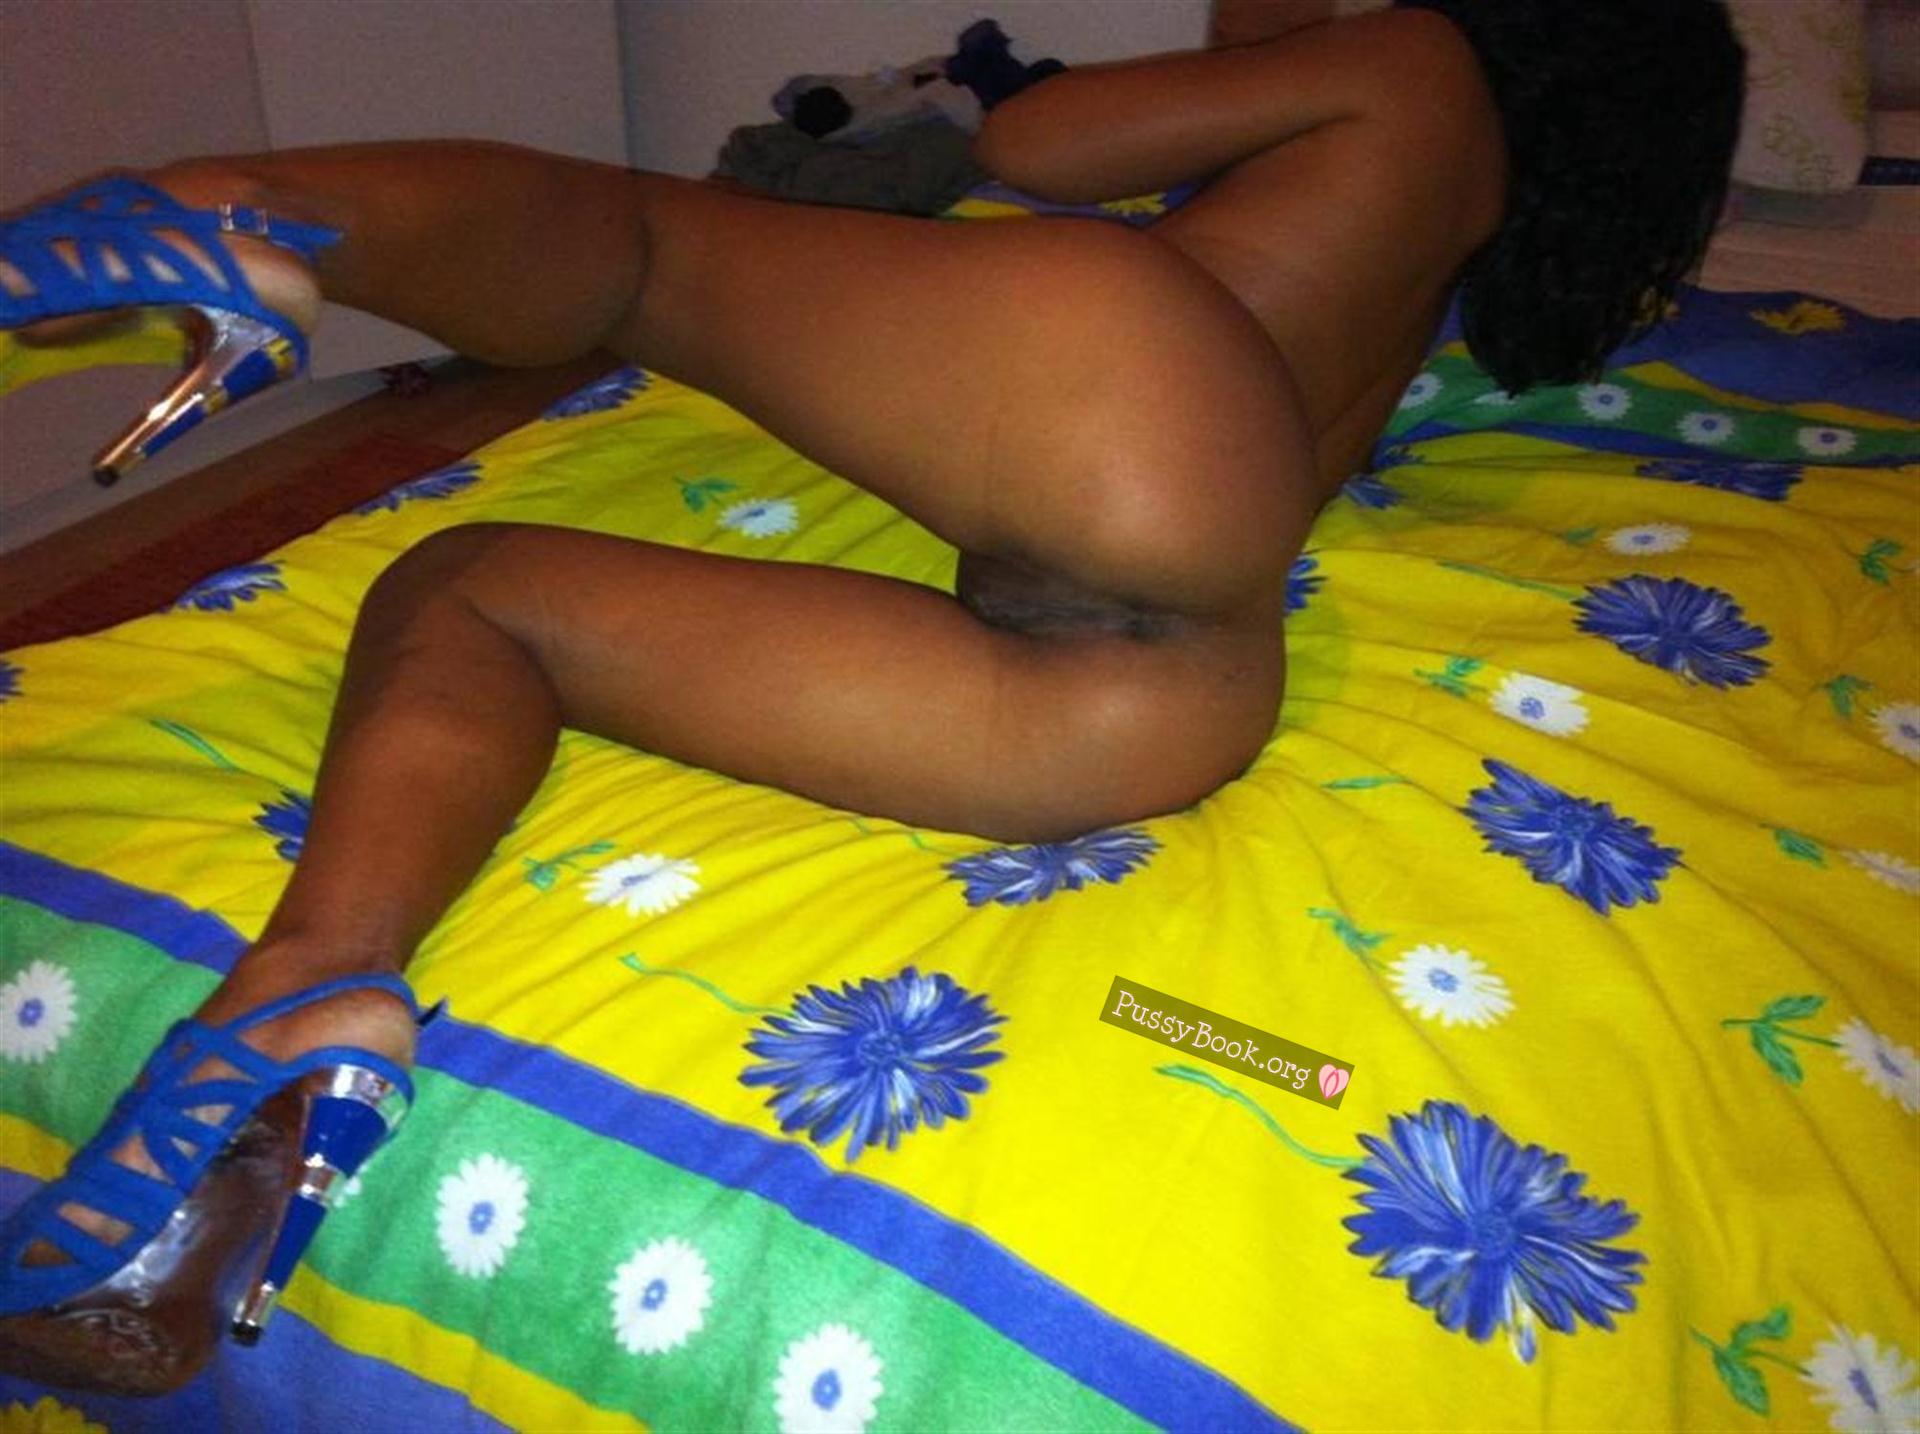 hot half naked girl pic sex